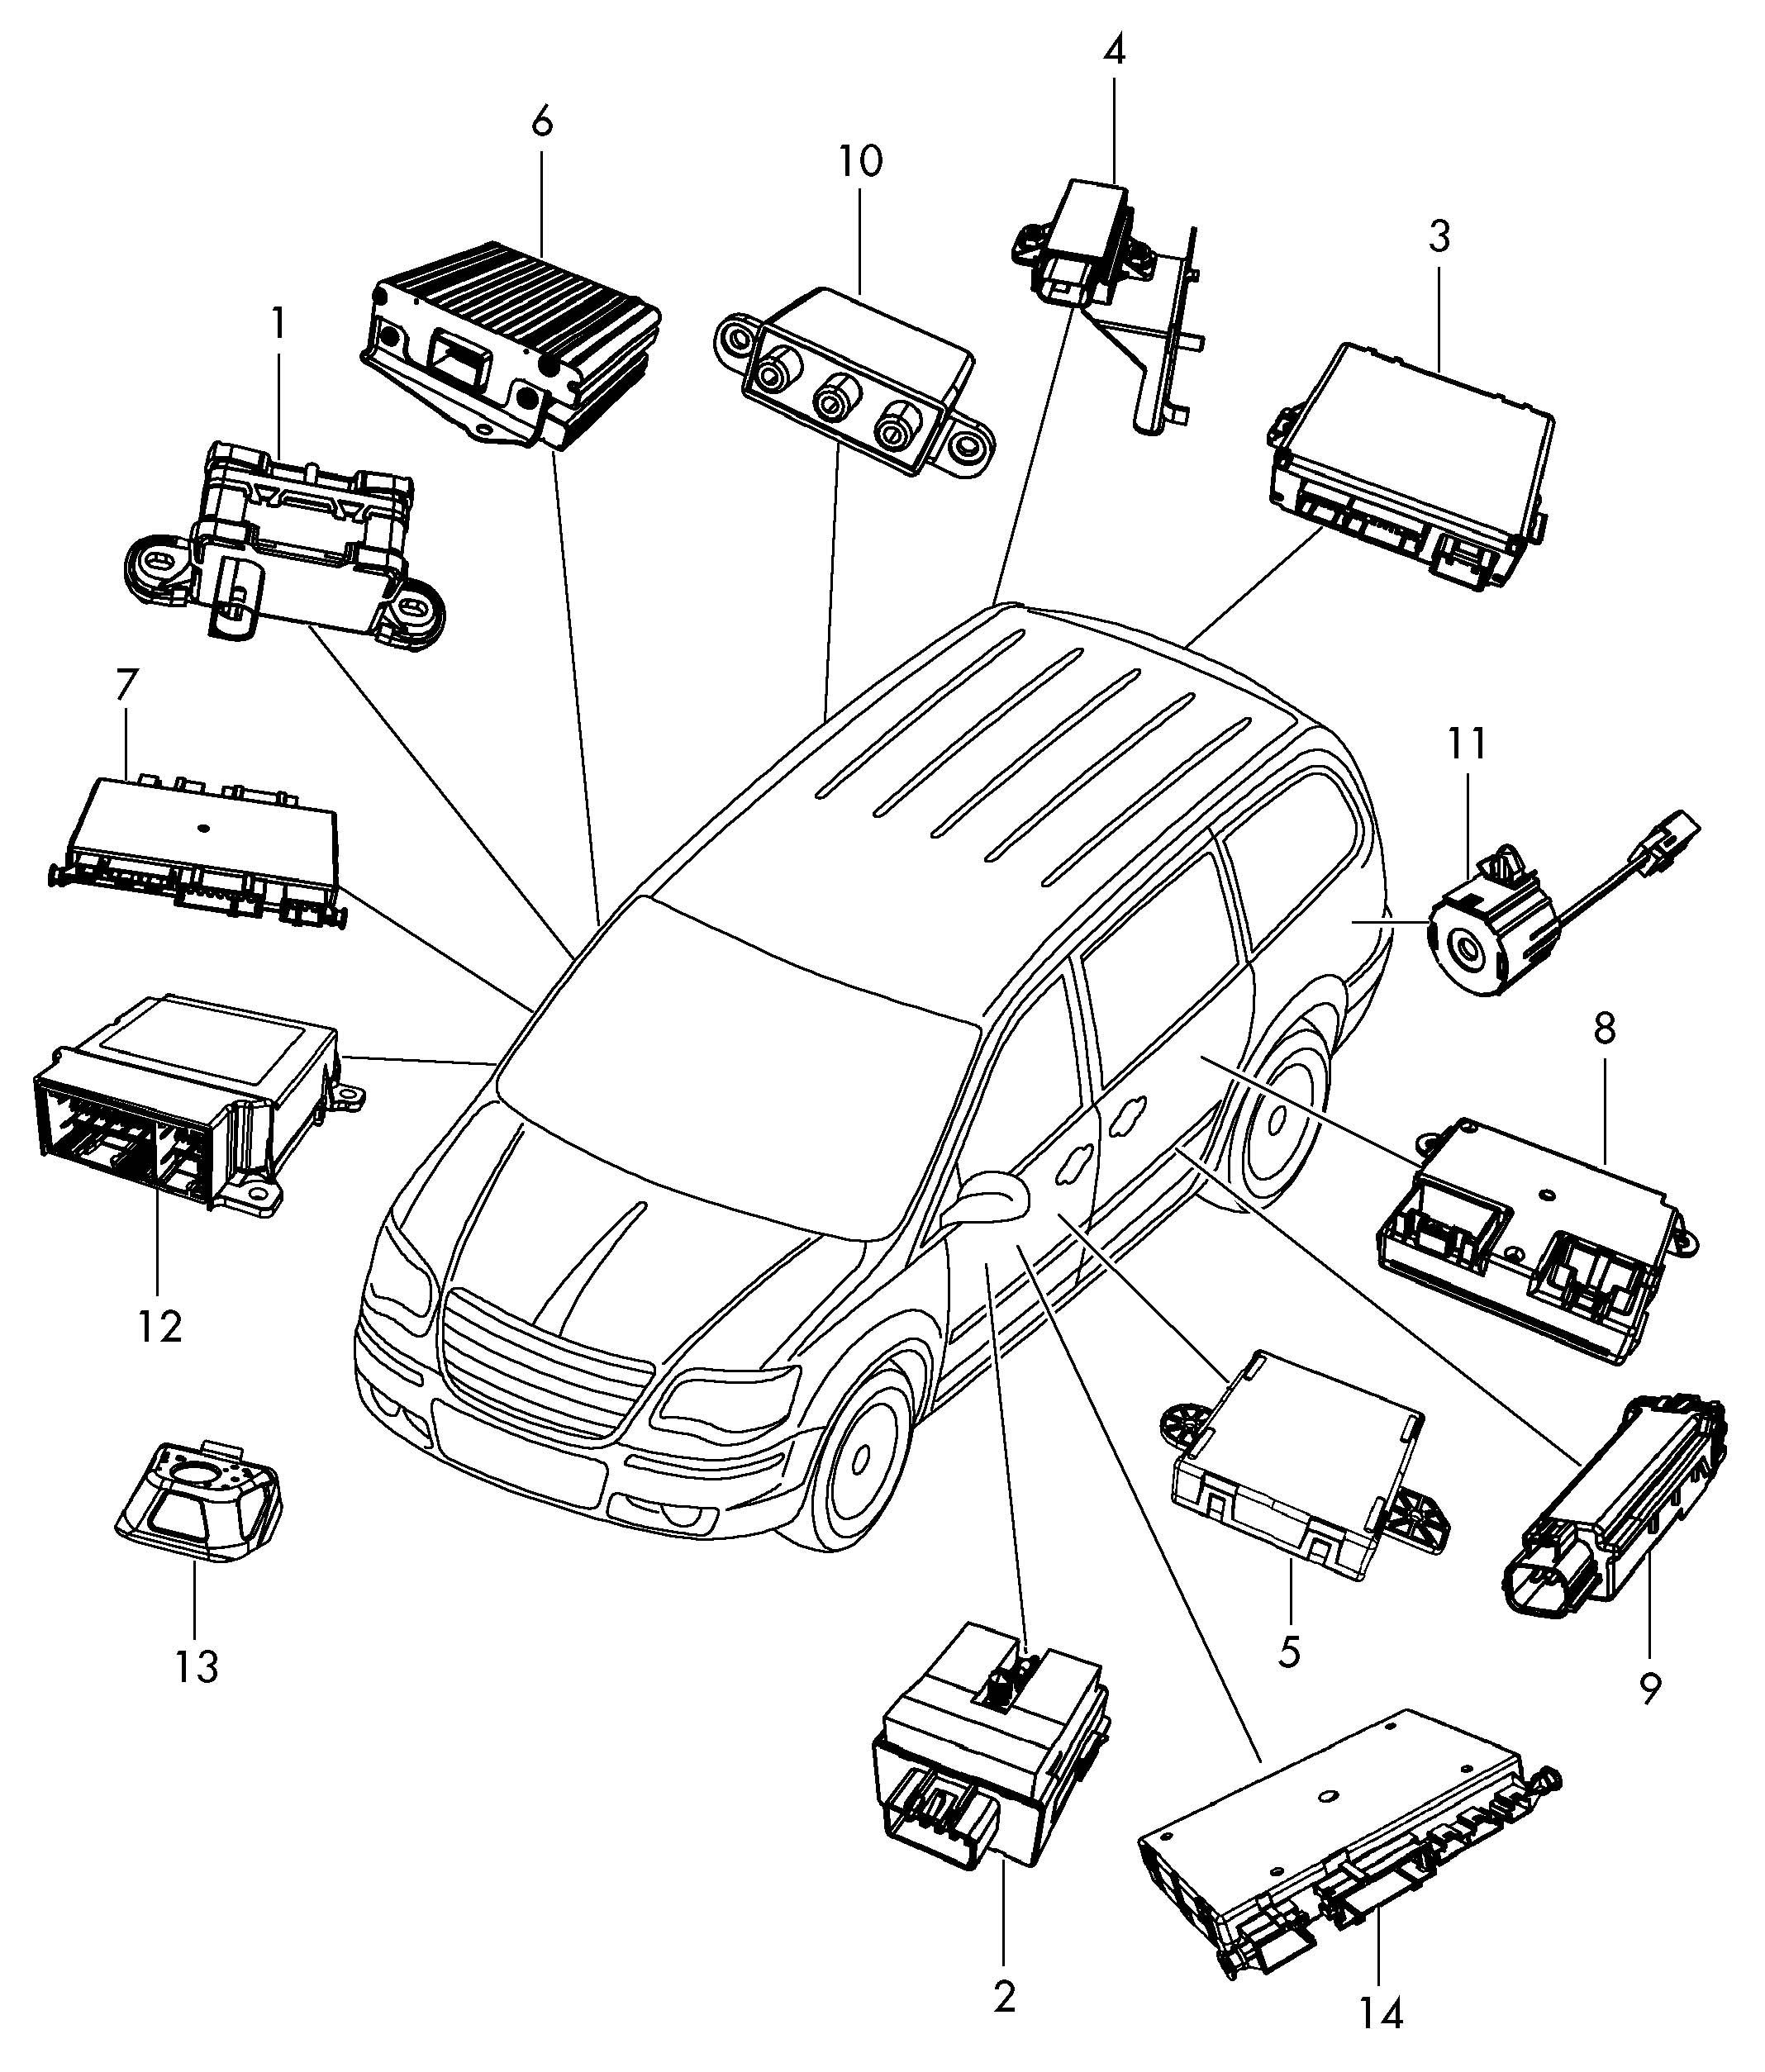 Volkswagen Routan Electronic Control Module Body Shell